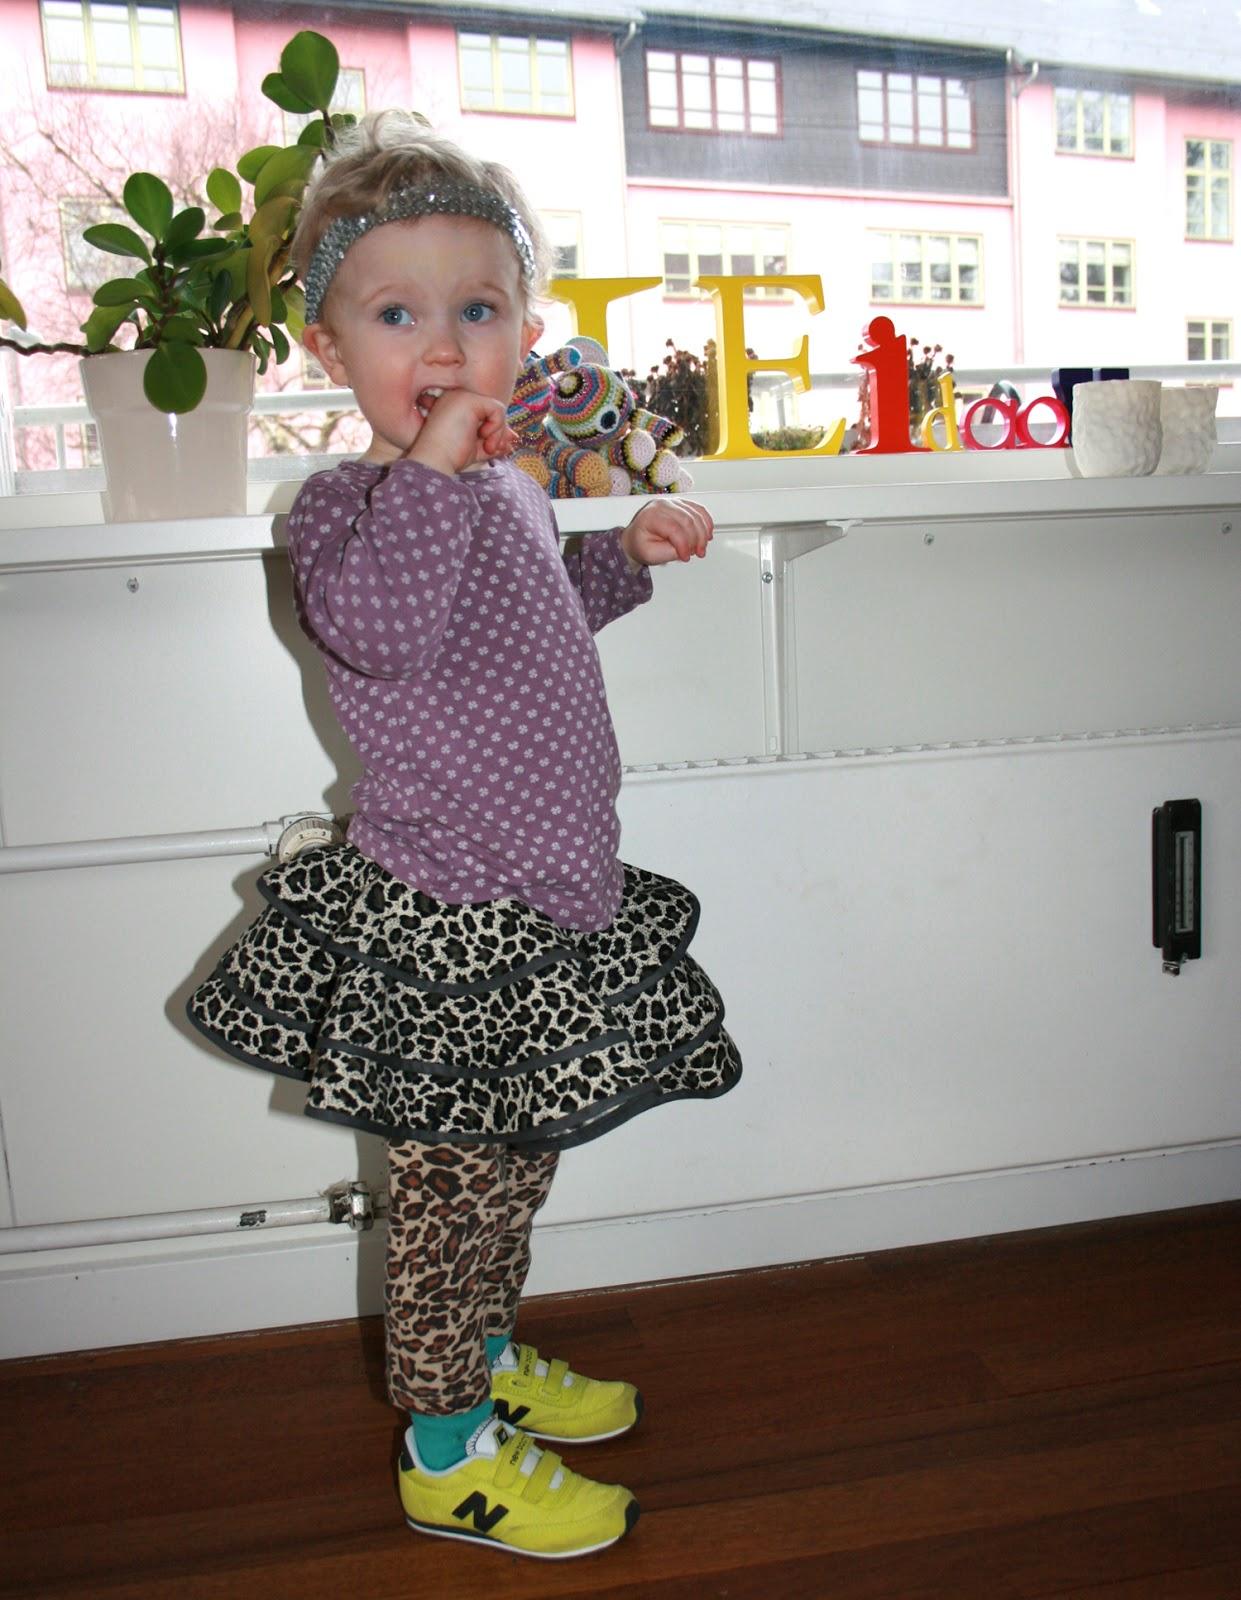 børnesikring stejl trappe